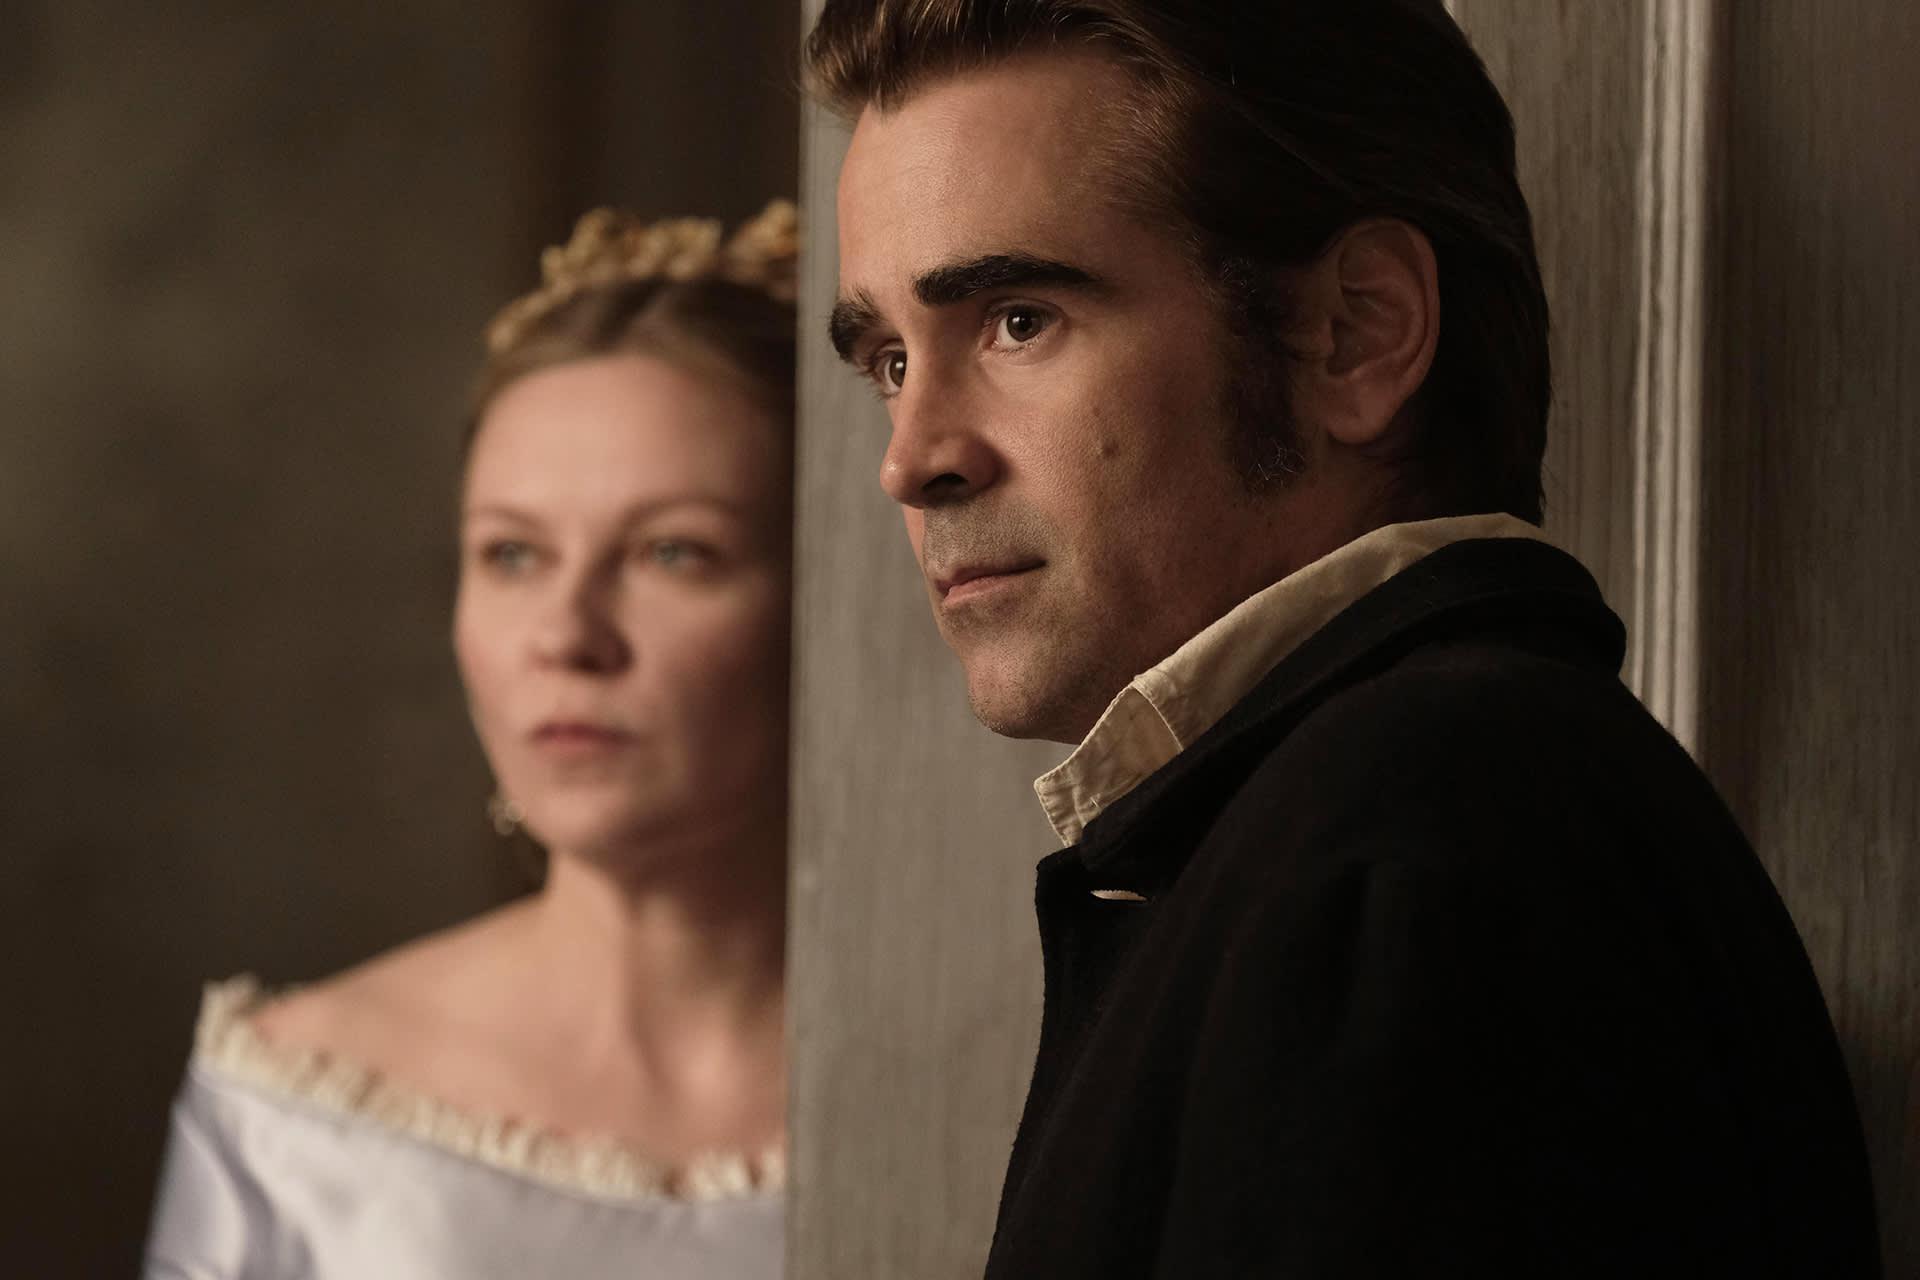 Nicole kidman ja Colin Farrell.